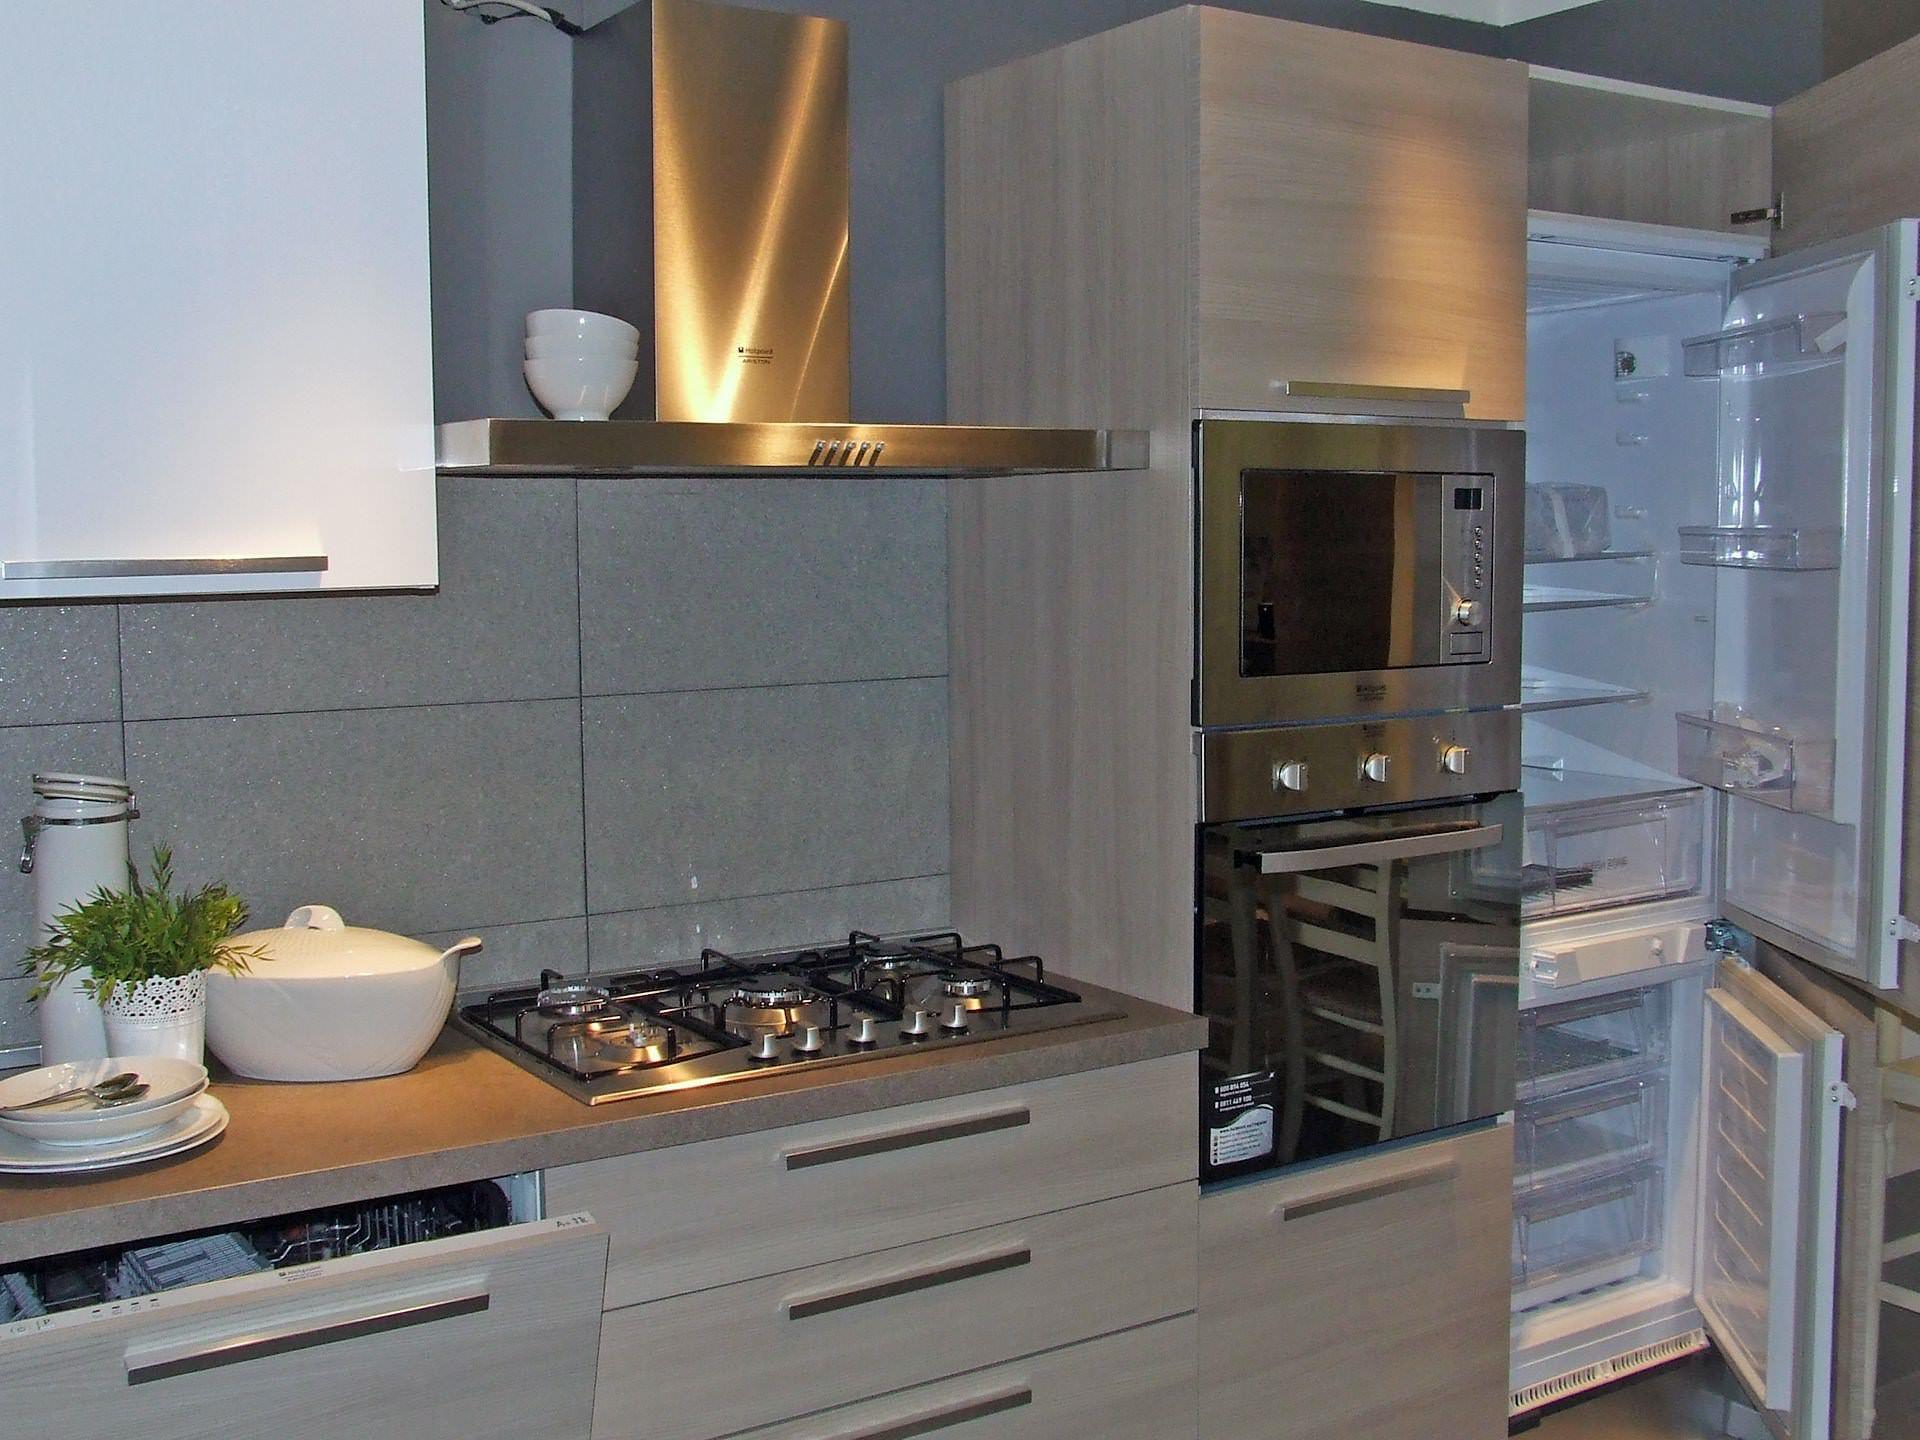 Emejing cucina aran prezzi contemporary ideas design - Cucine aran prezzi ...